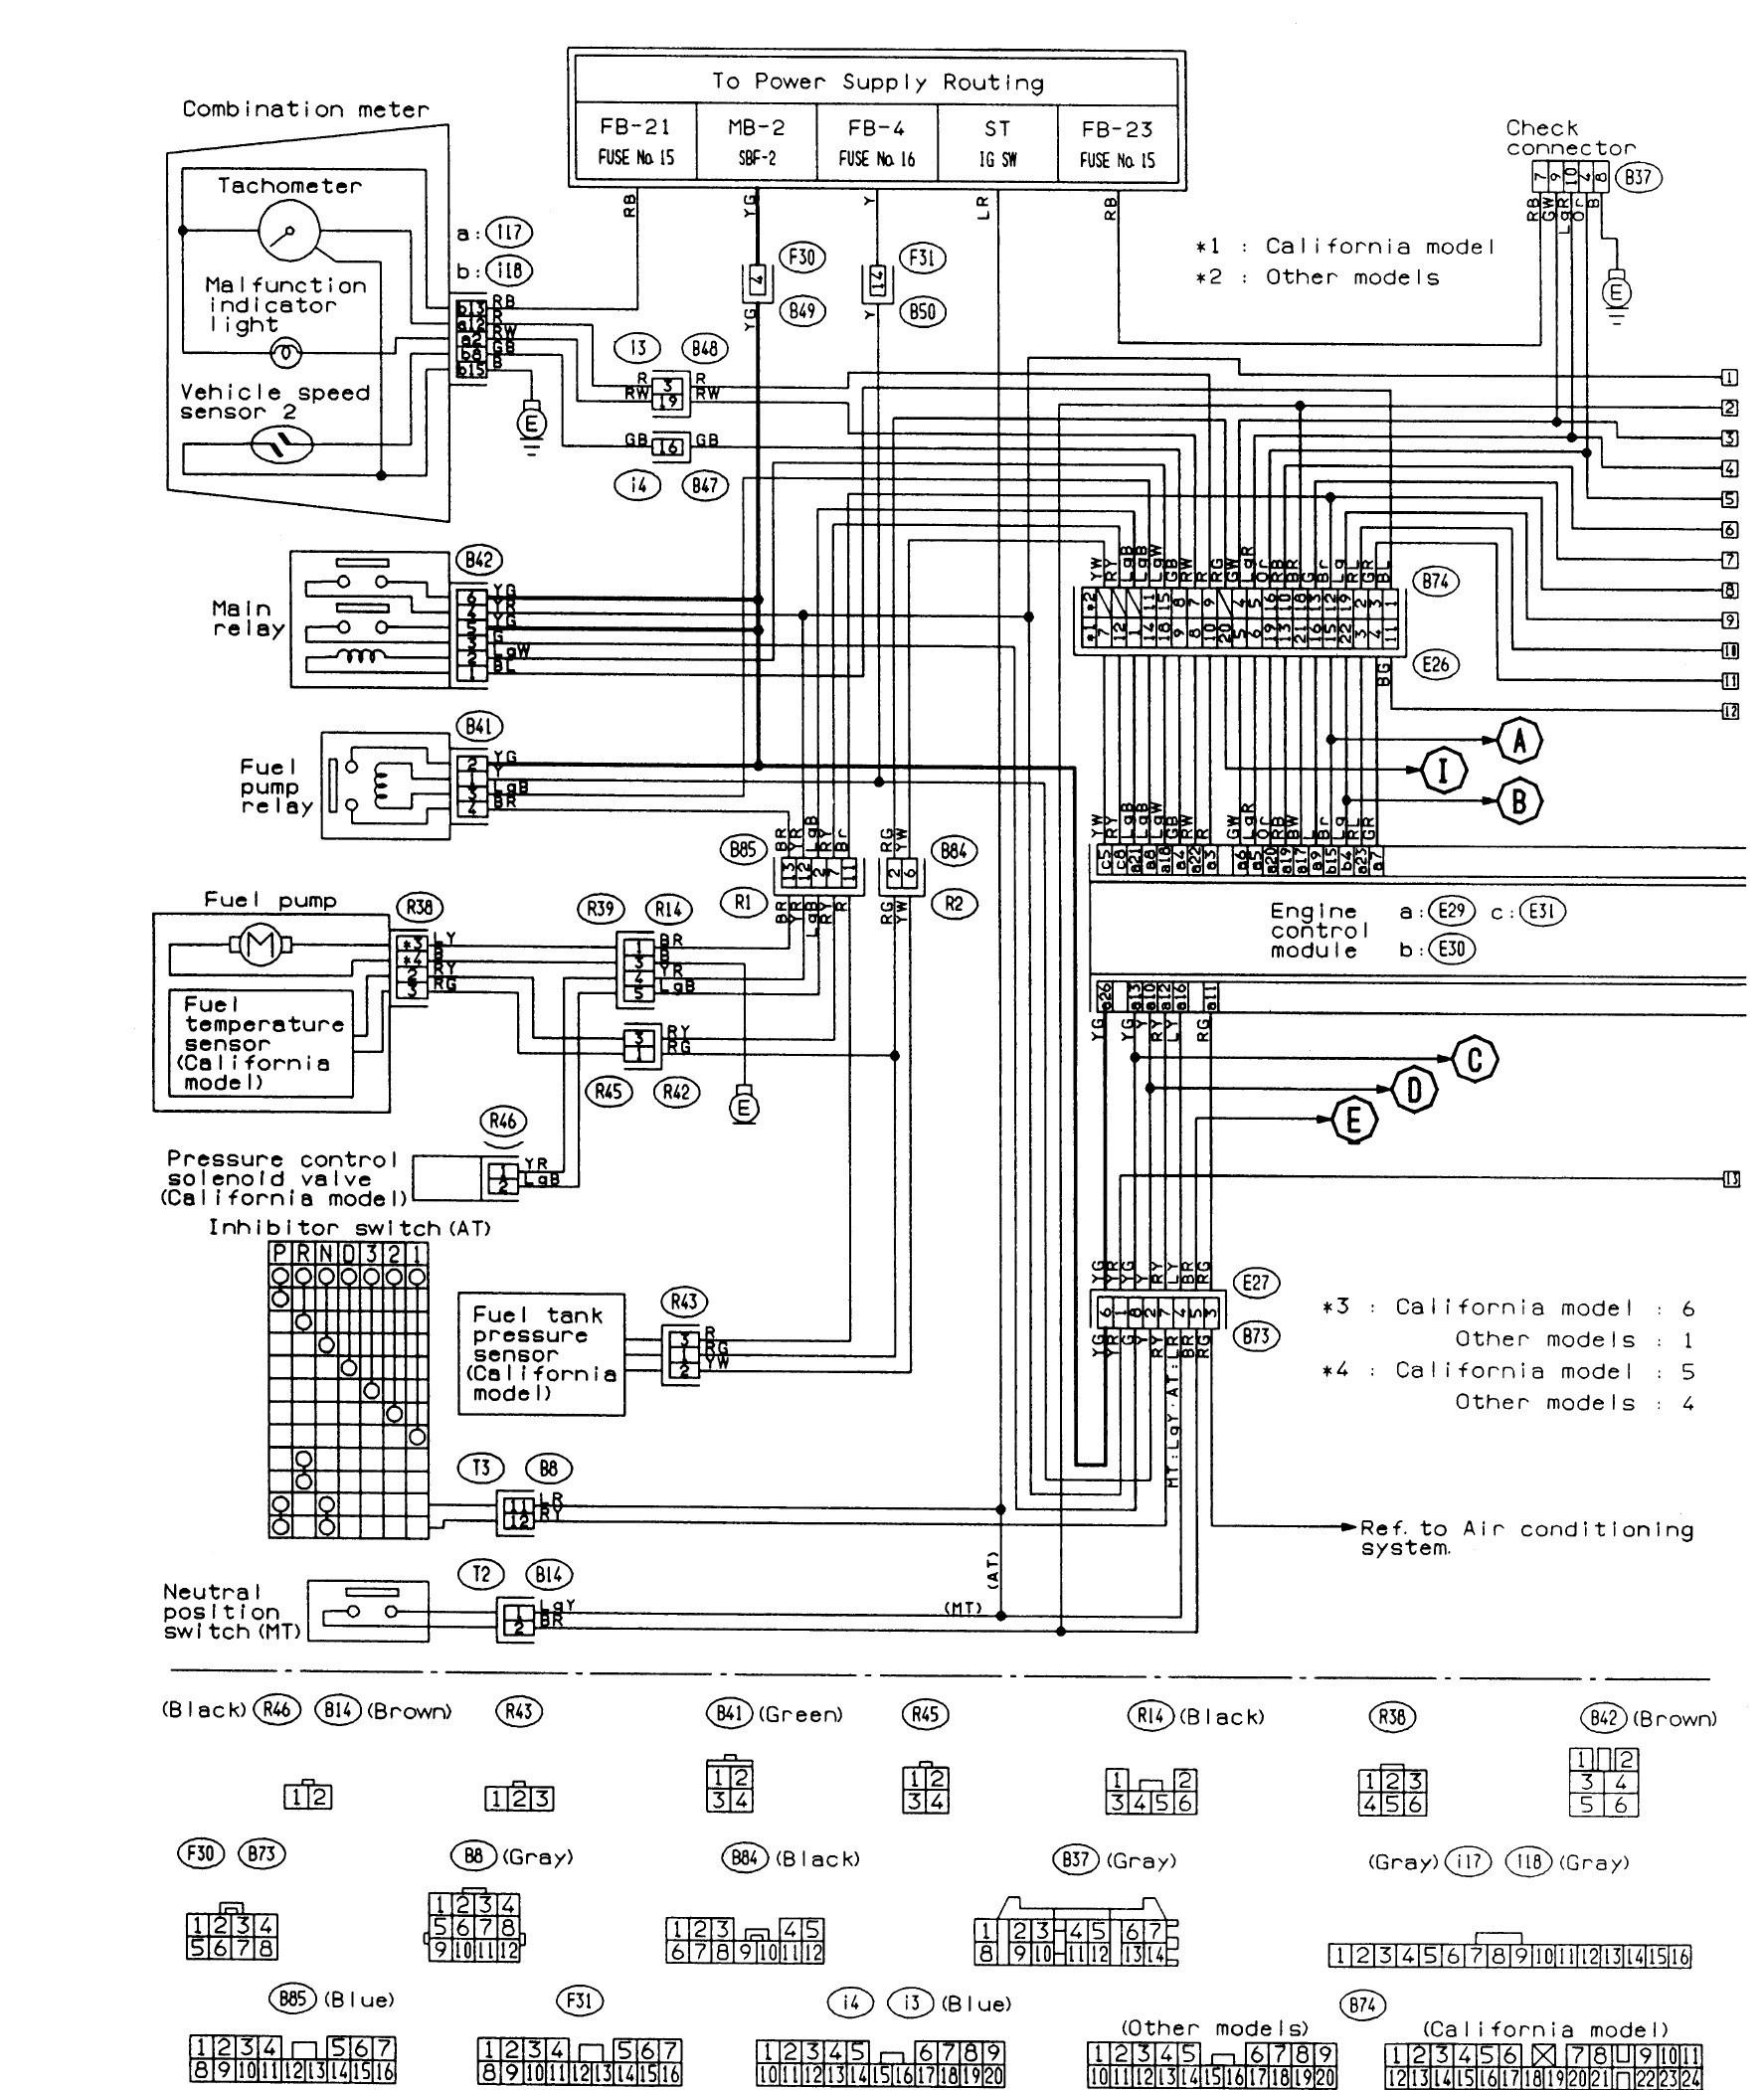 Rockford Fosgate Prime R500 1 Wiring Diagram - Zookastar - Rockford Fosgate Wiring Diagram